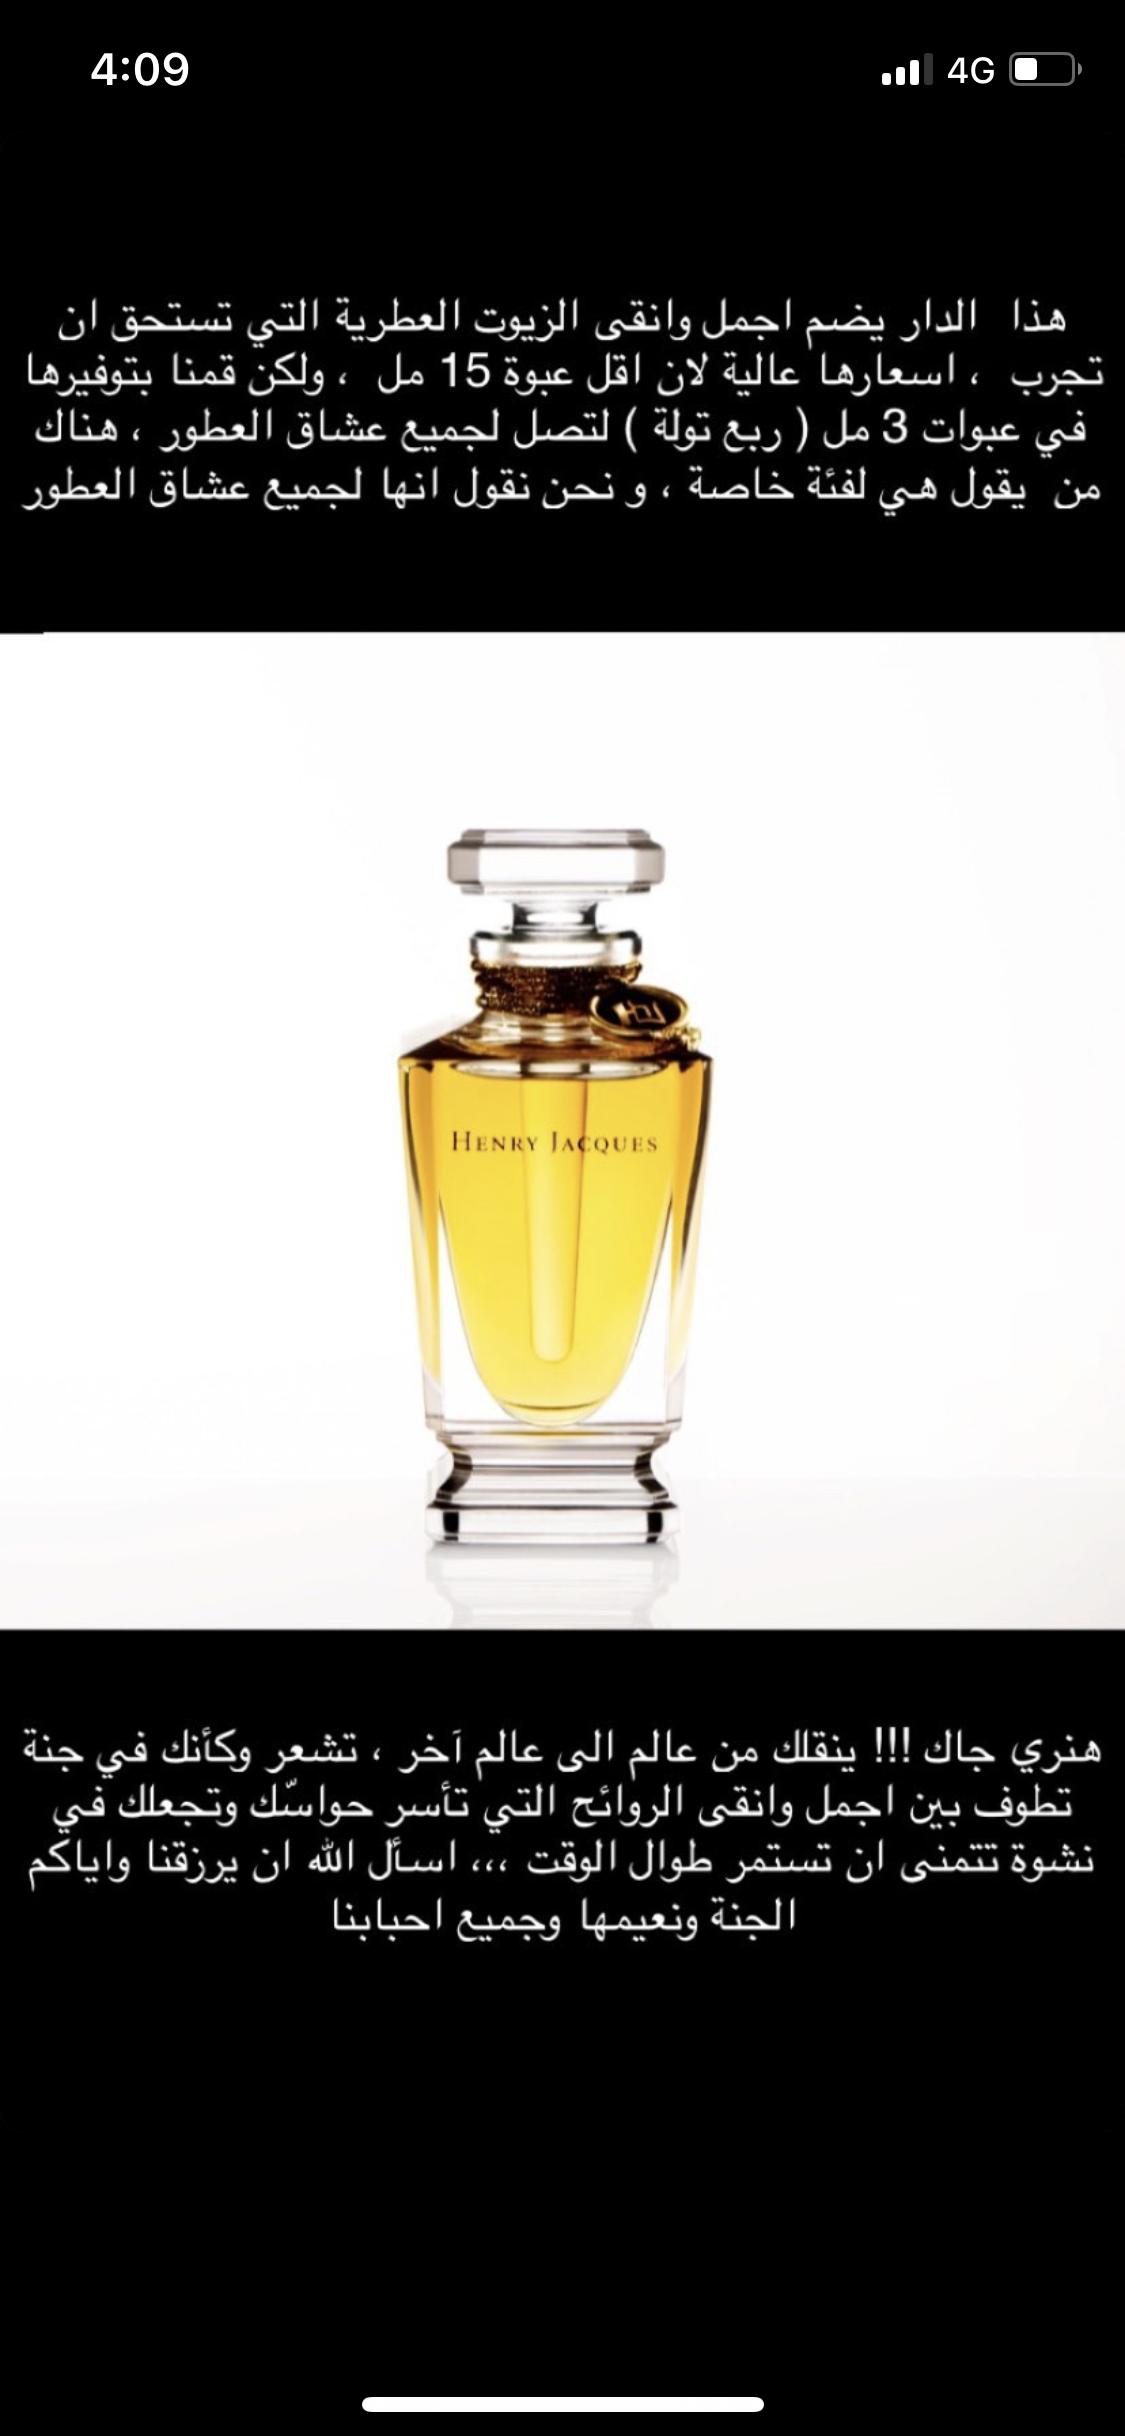 Pin By Samar Anan On عطور فرنسية Perfume Condiments Salt